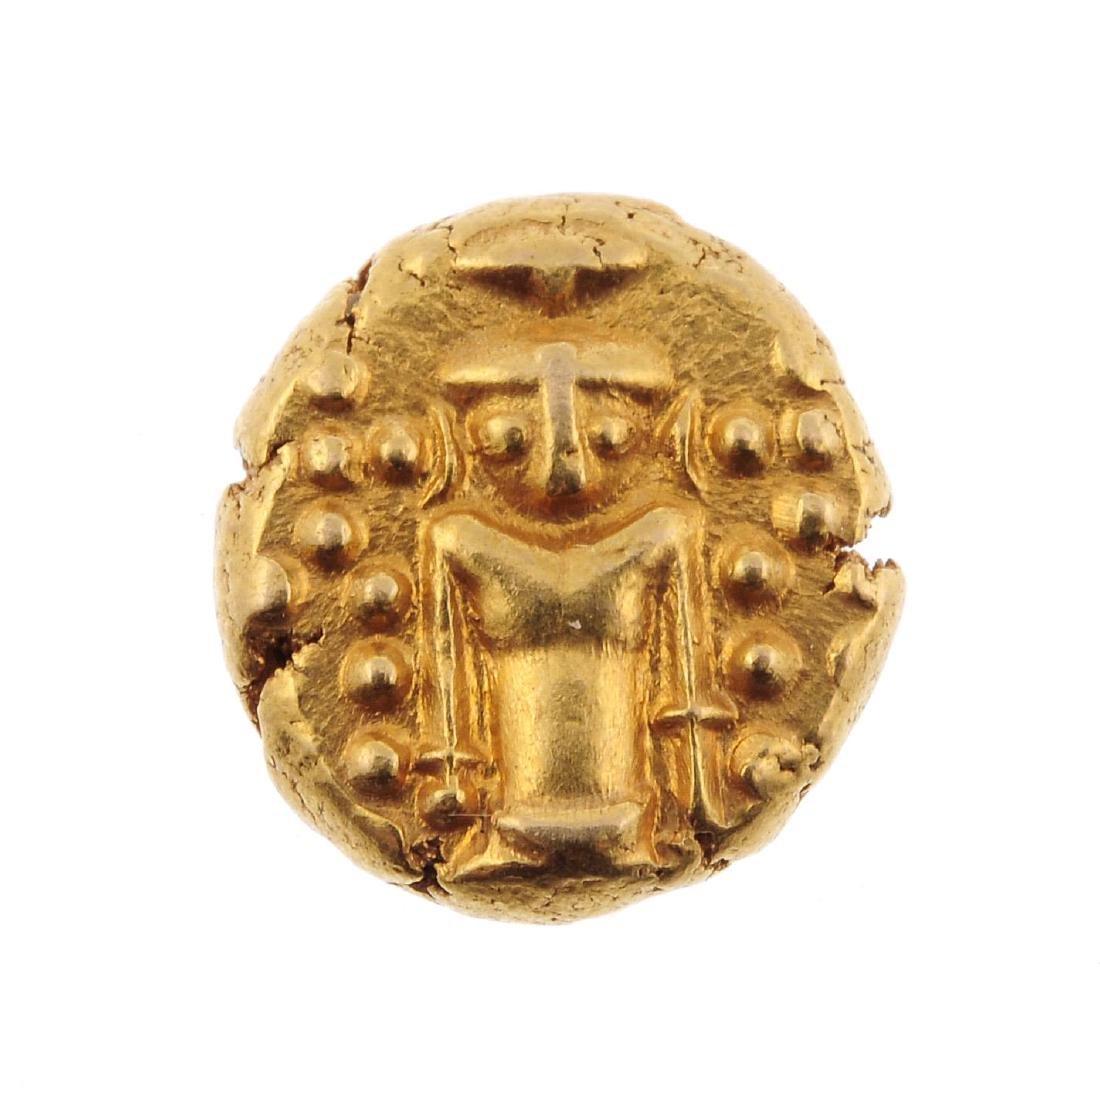 India, East India Company, Madras Presidency, gold Star